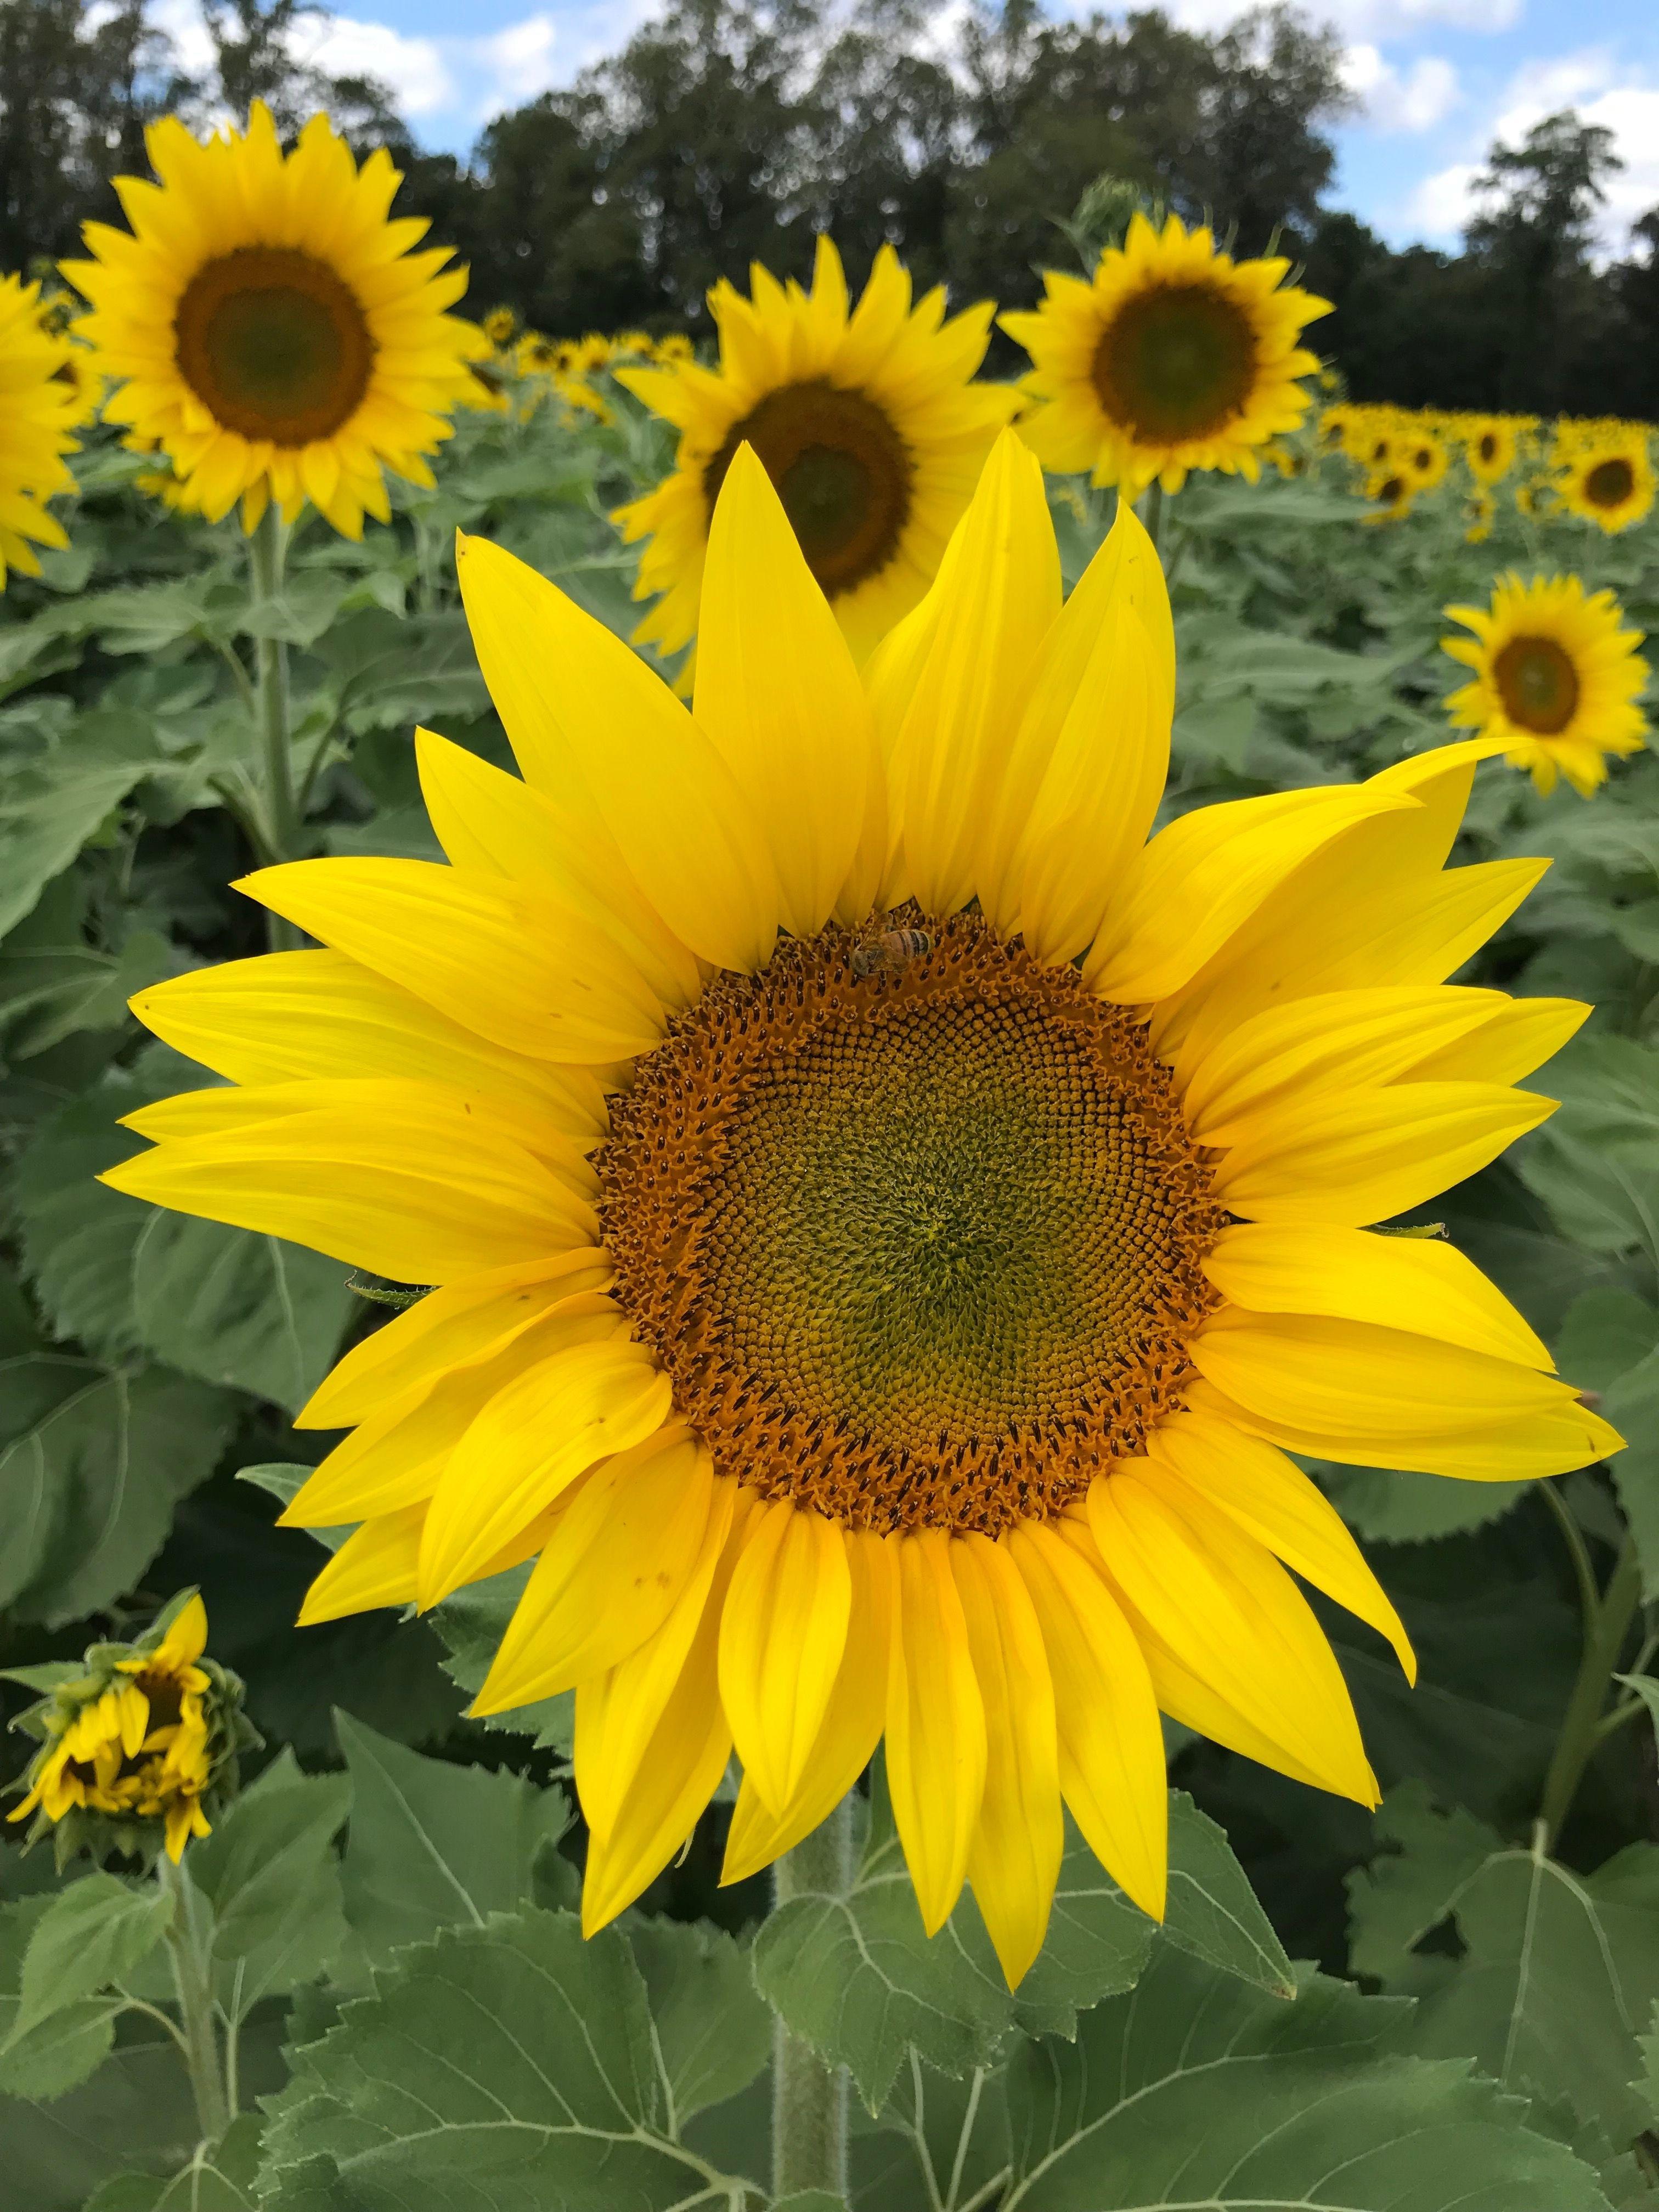 Pin By Karen Kucharczyk On Sunflowers Plants Sunflower Garden